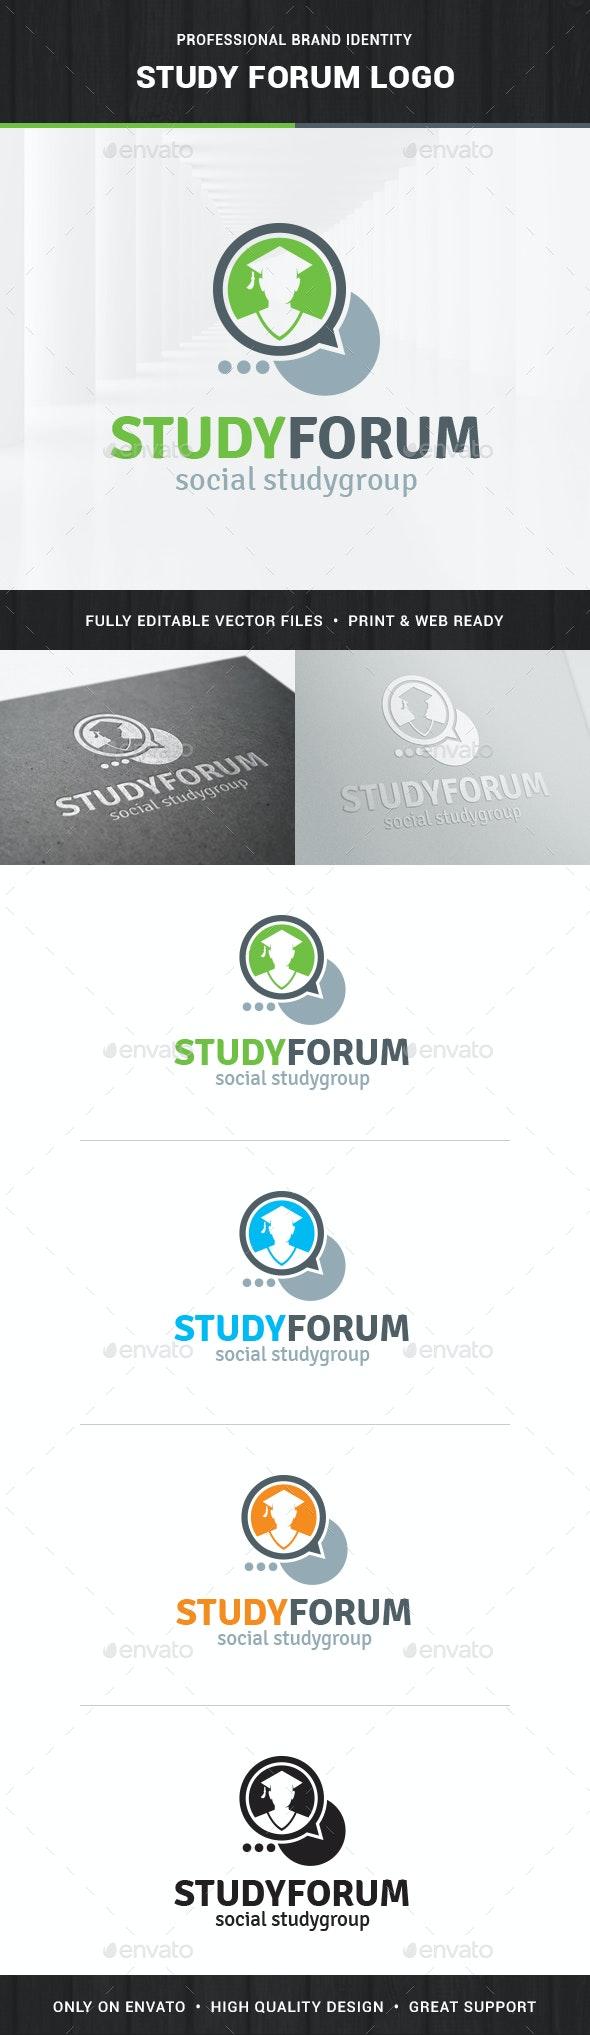 Study Forum Logo Template - College Logo Templates